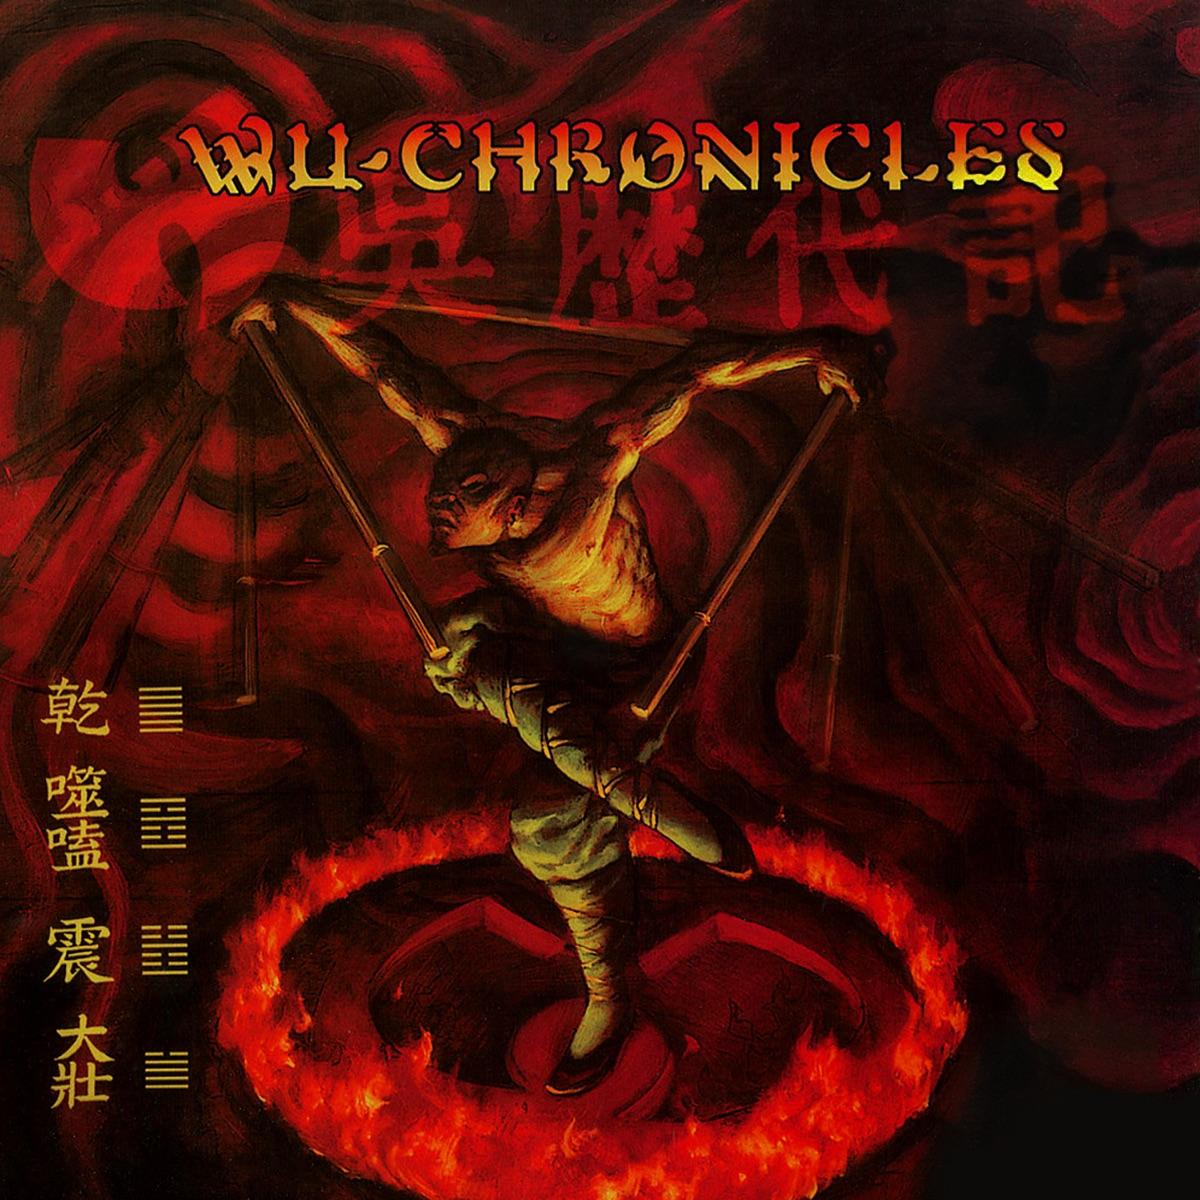 Wu-Chronicles Album Cover by Wu-Tang Clan